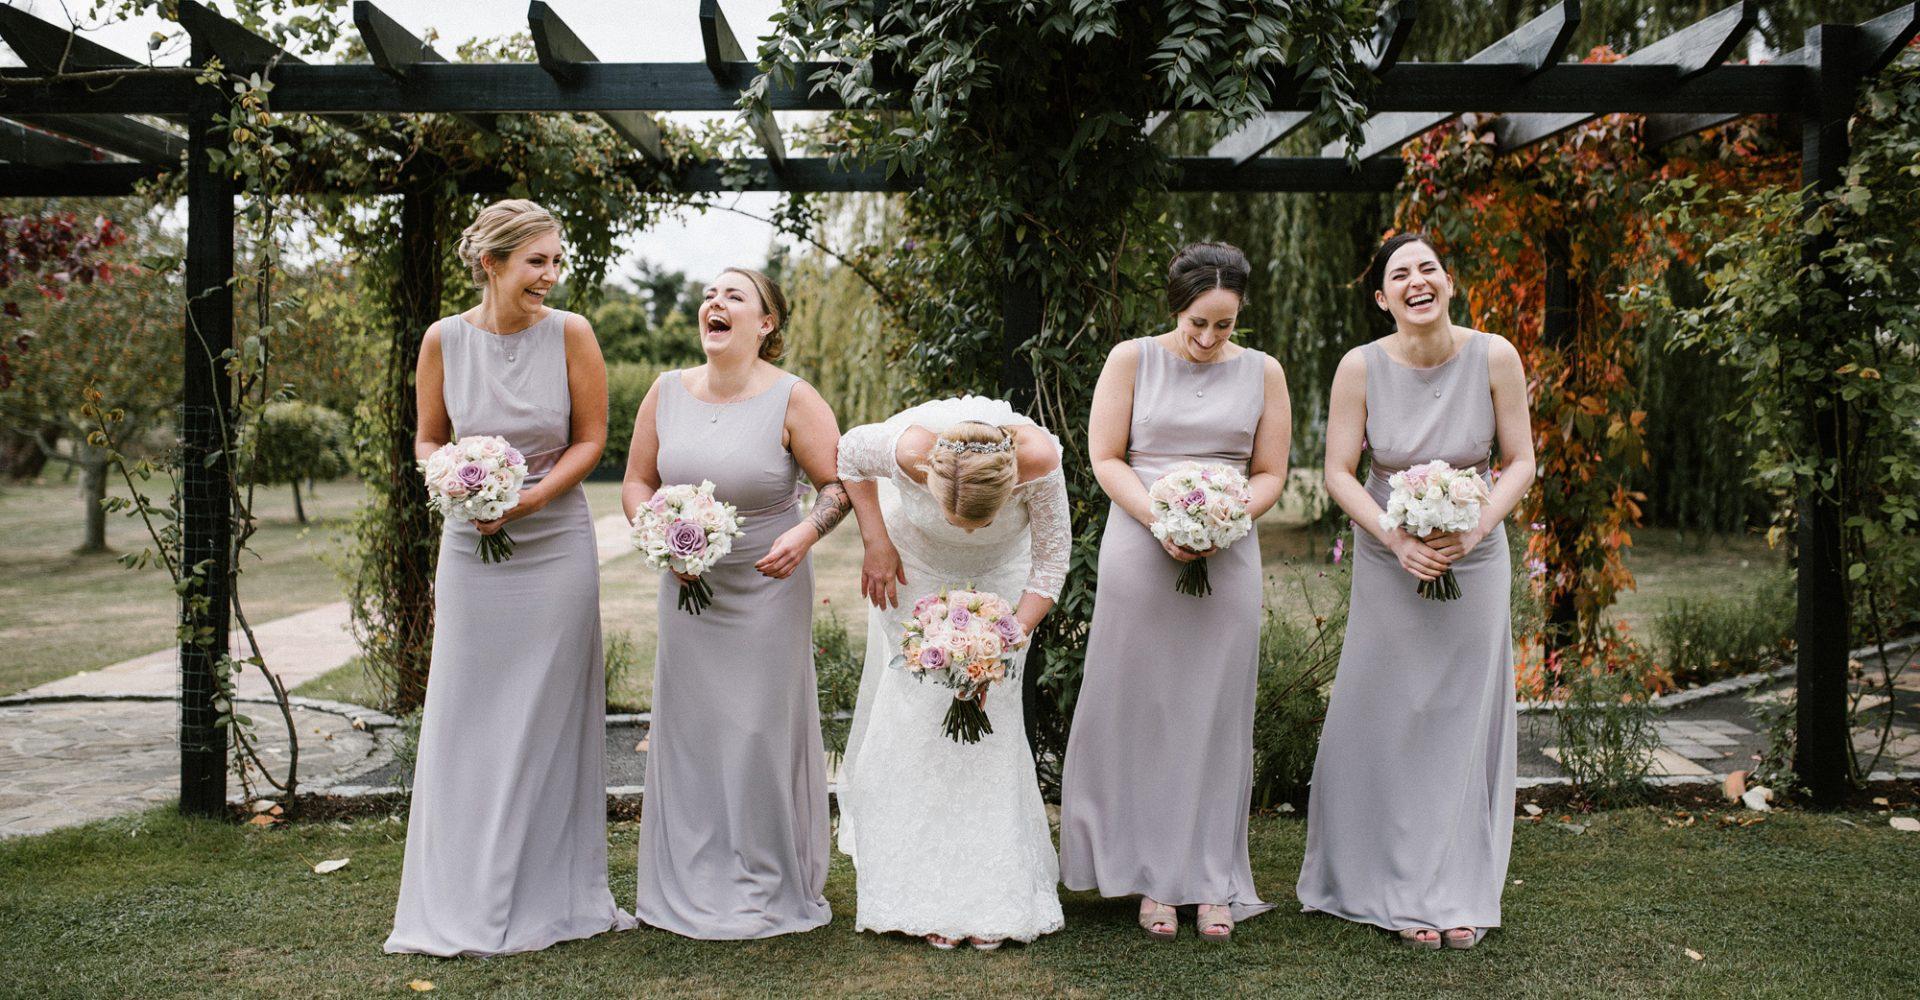 Wedding Photographer in Essex